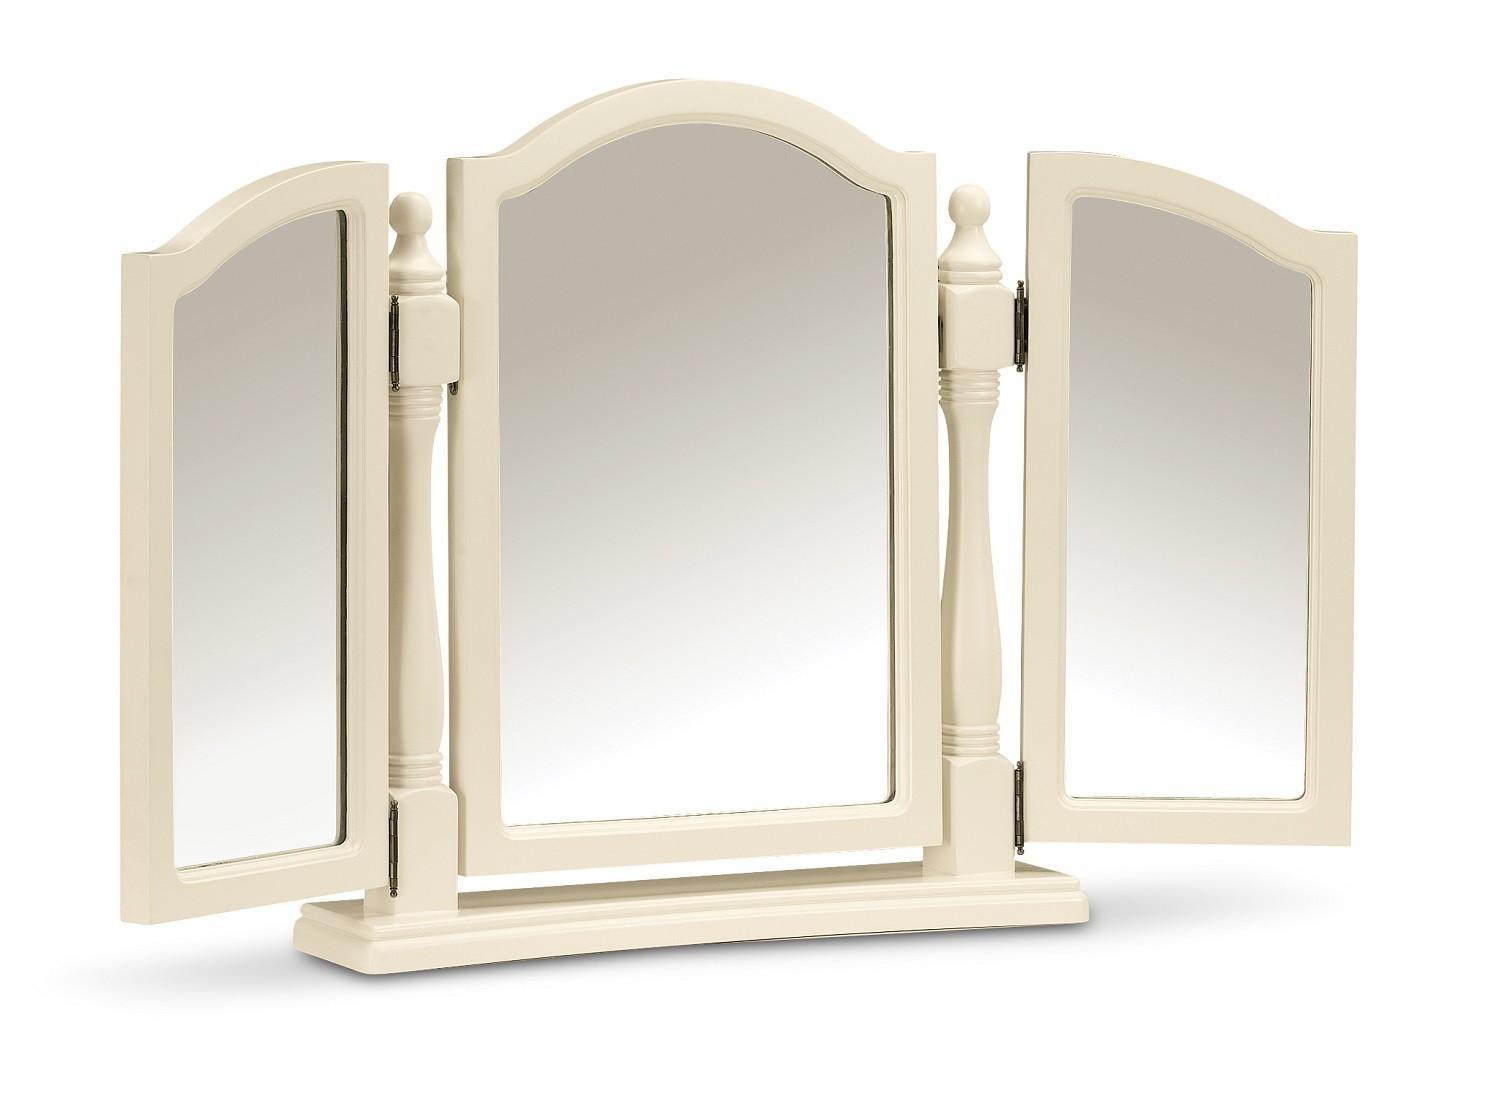 Solid Wood Dressing Table Mirrors | Oak | Oak Furniture Uk Inside Dressing Table Mirrors (Image 14 of 20)